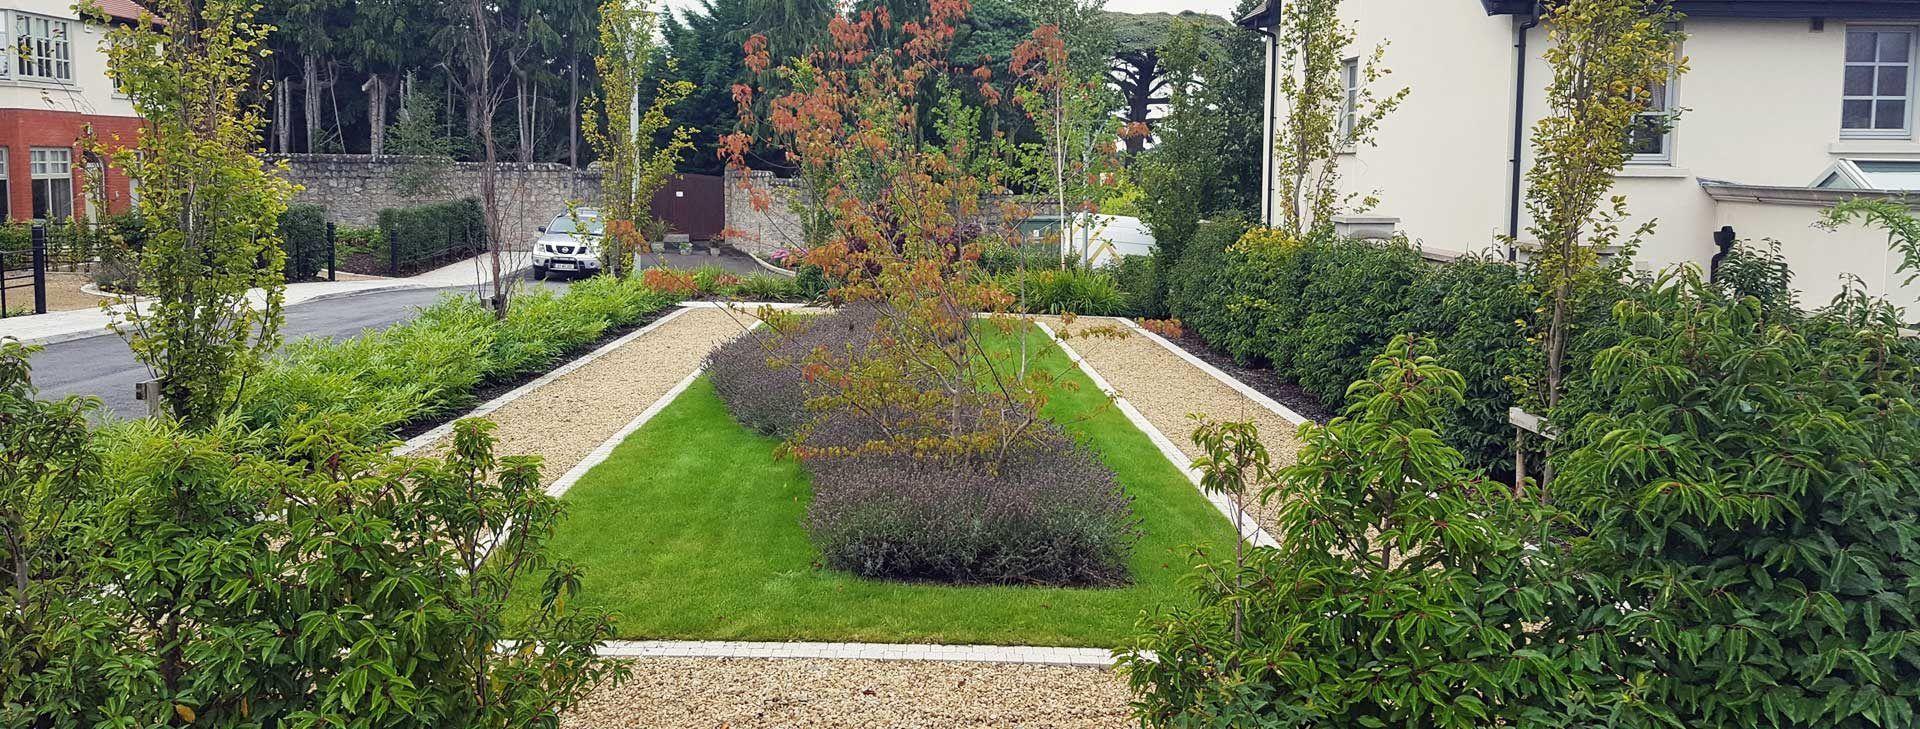 Delaney Landscaping Landscaping Mullingar Landscaping Westmeath Landscaper Mullingar Landsc Landscape Services Commercial Landscaping Landscape Projects